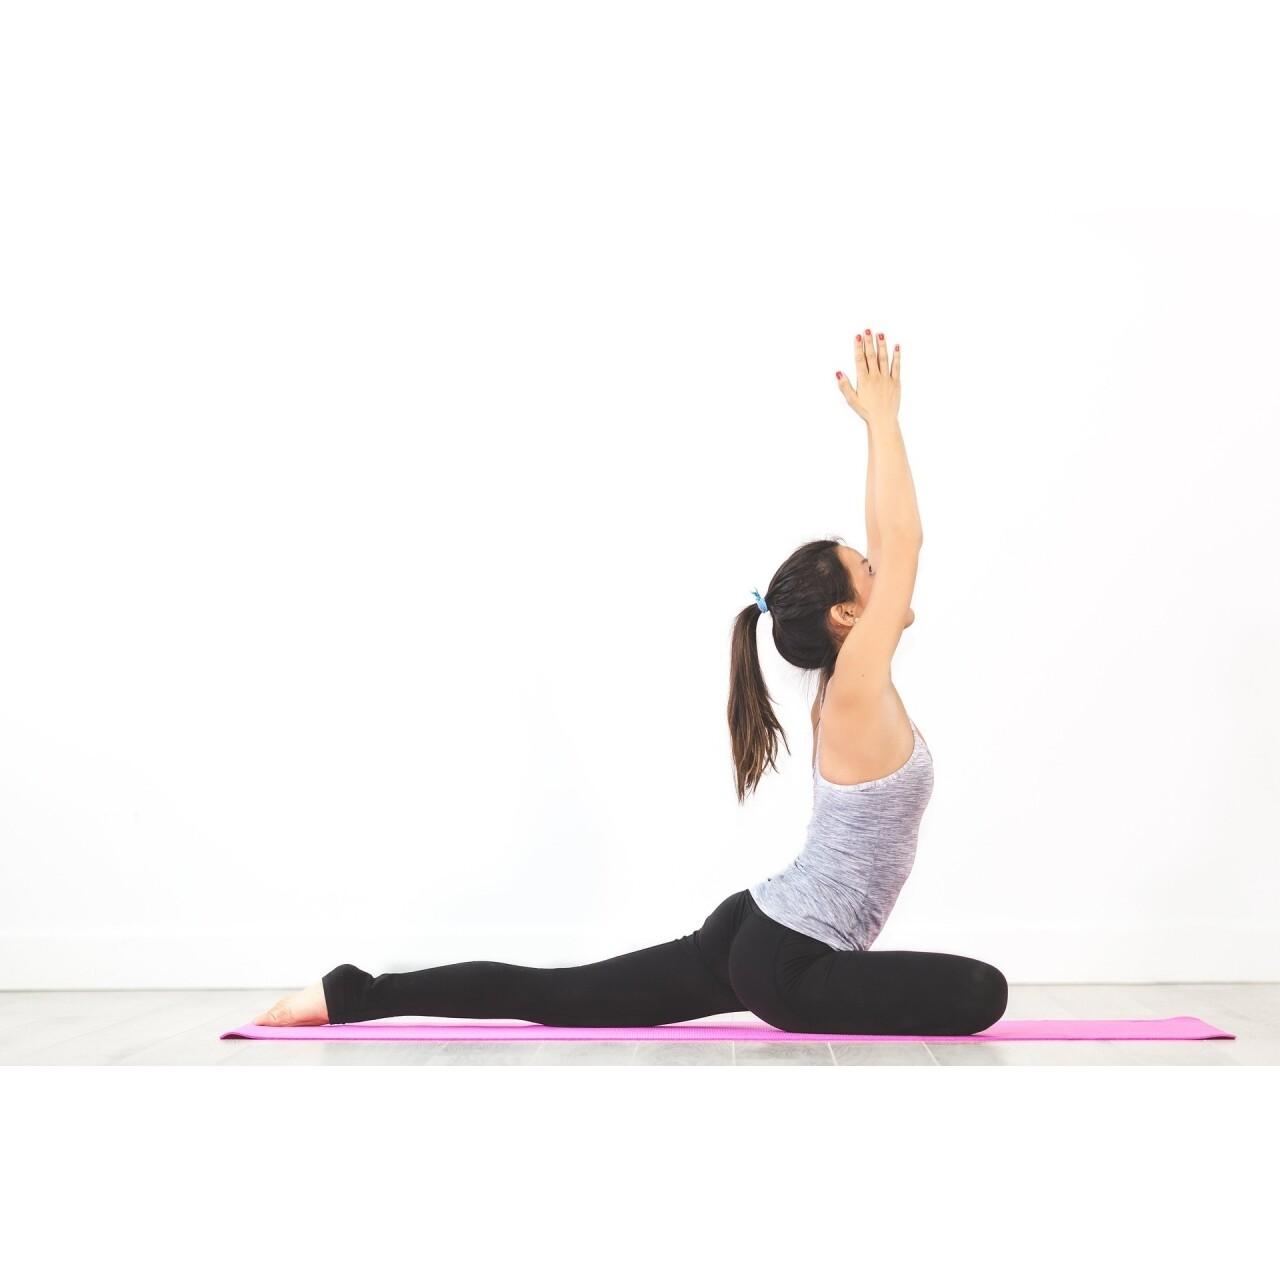 Saltea Fitness/Yoga/Pilates Jocca Pink 60x173x0.5 cm